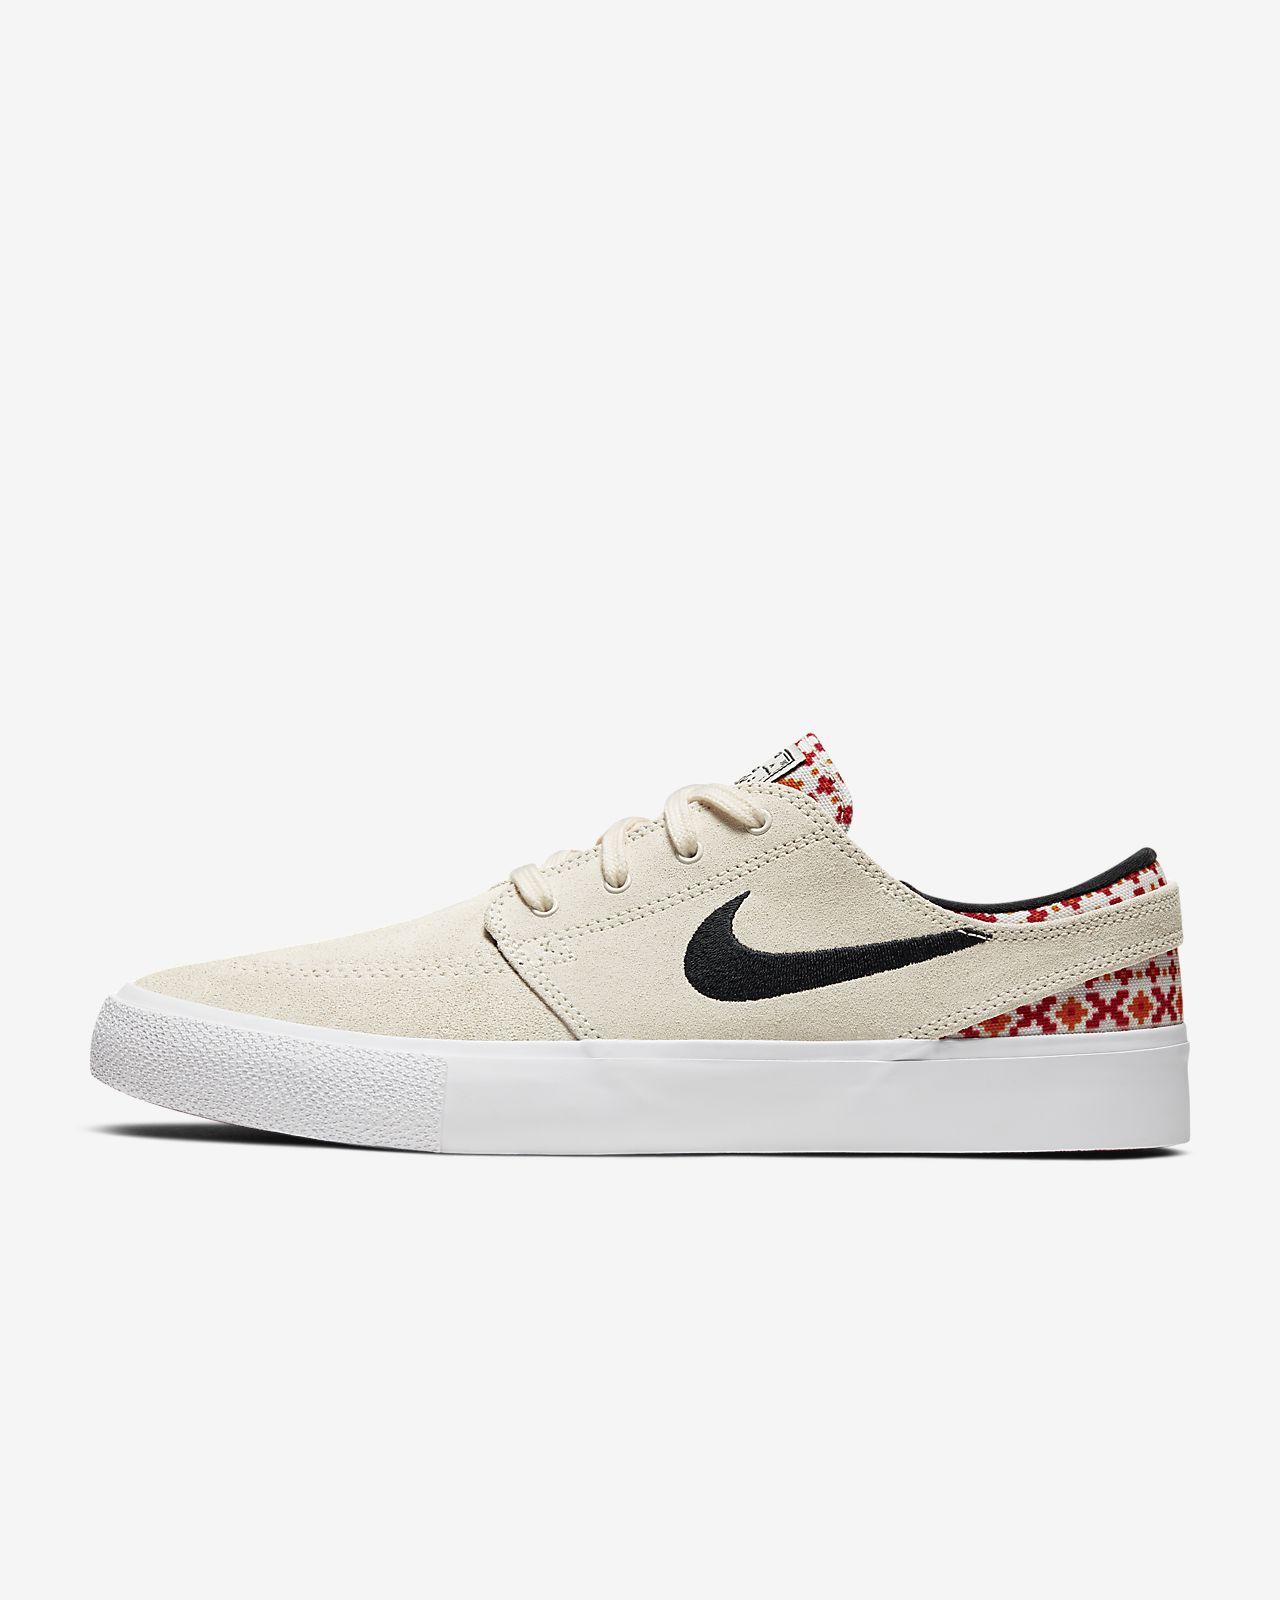 Nike SB Zoom Stefan Janoski RM Premium Skate Shoe